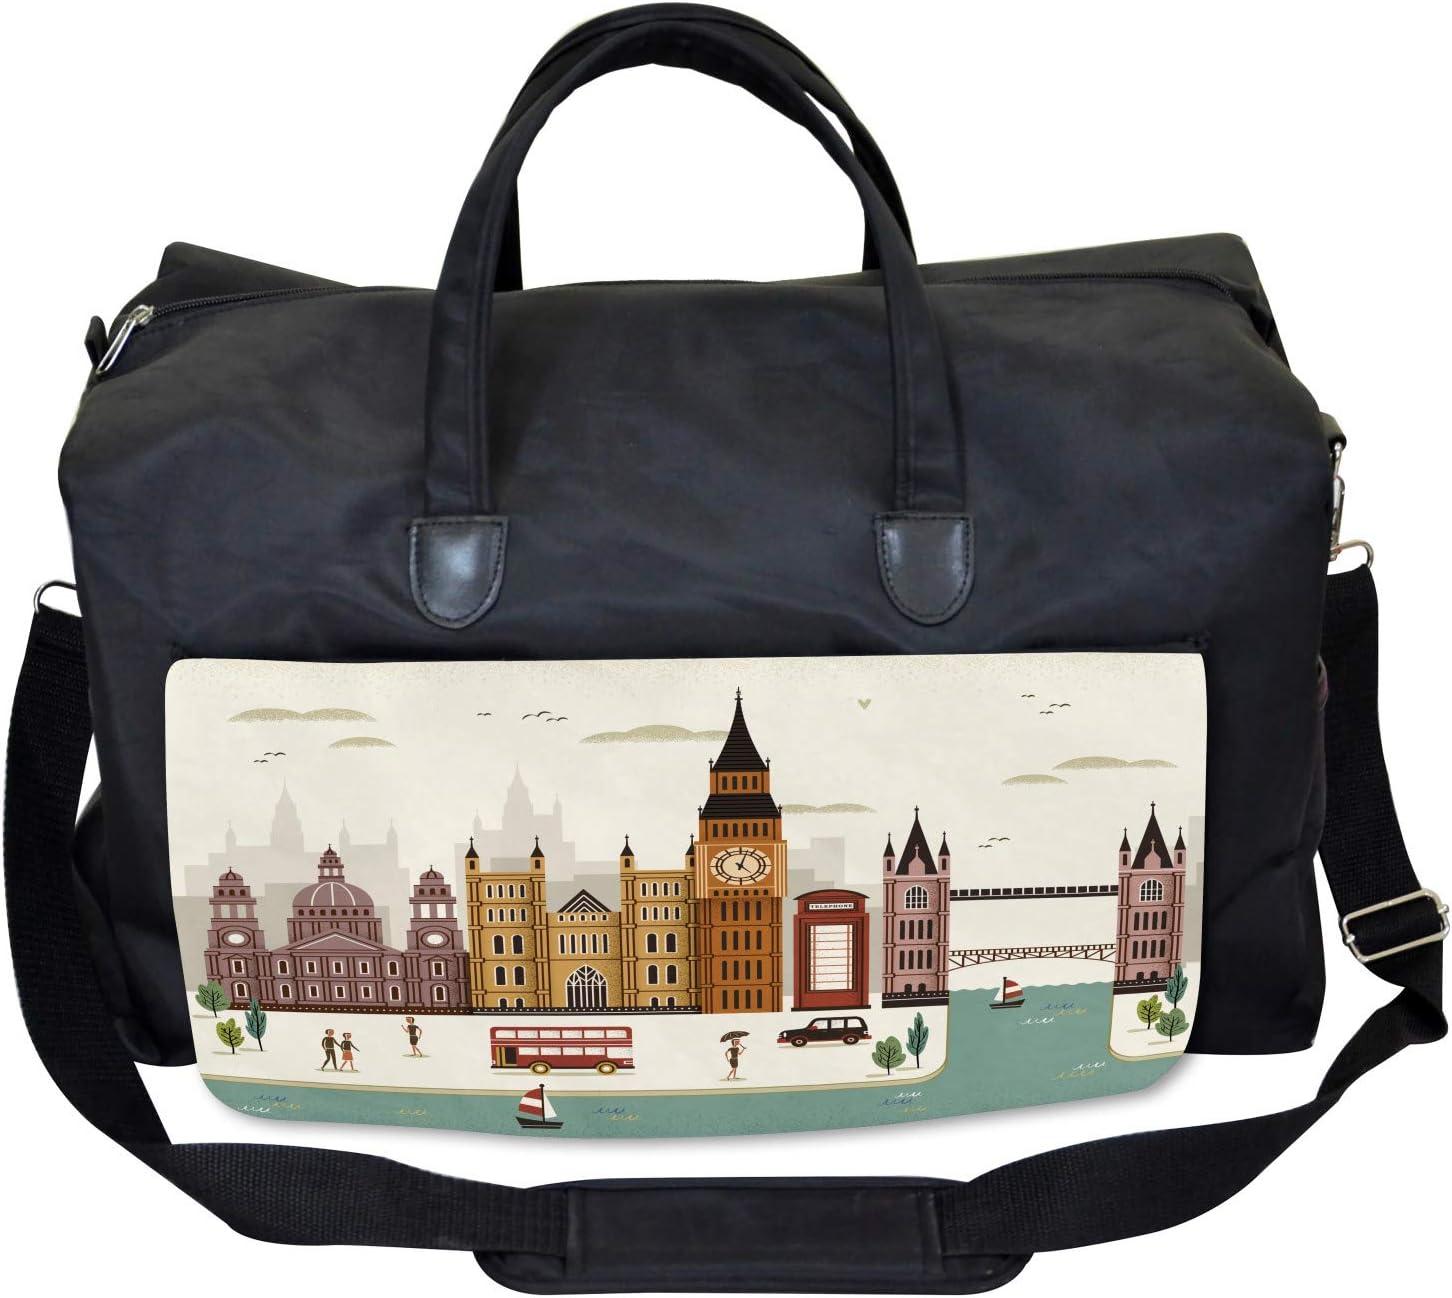 Ambesonne London Gym Bag Travel Scenery Big Ben Large Weekender Carry-on